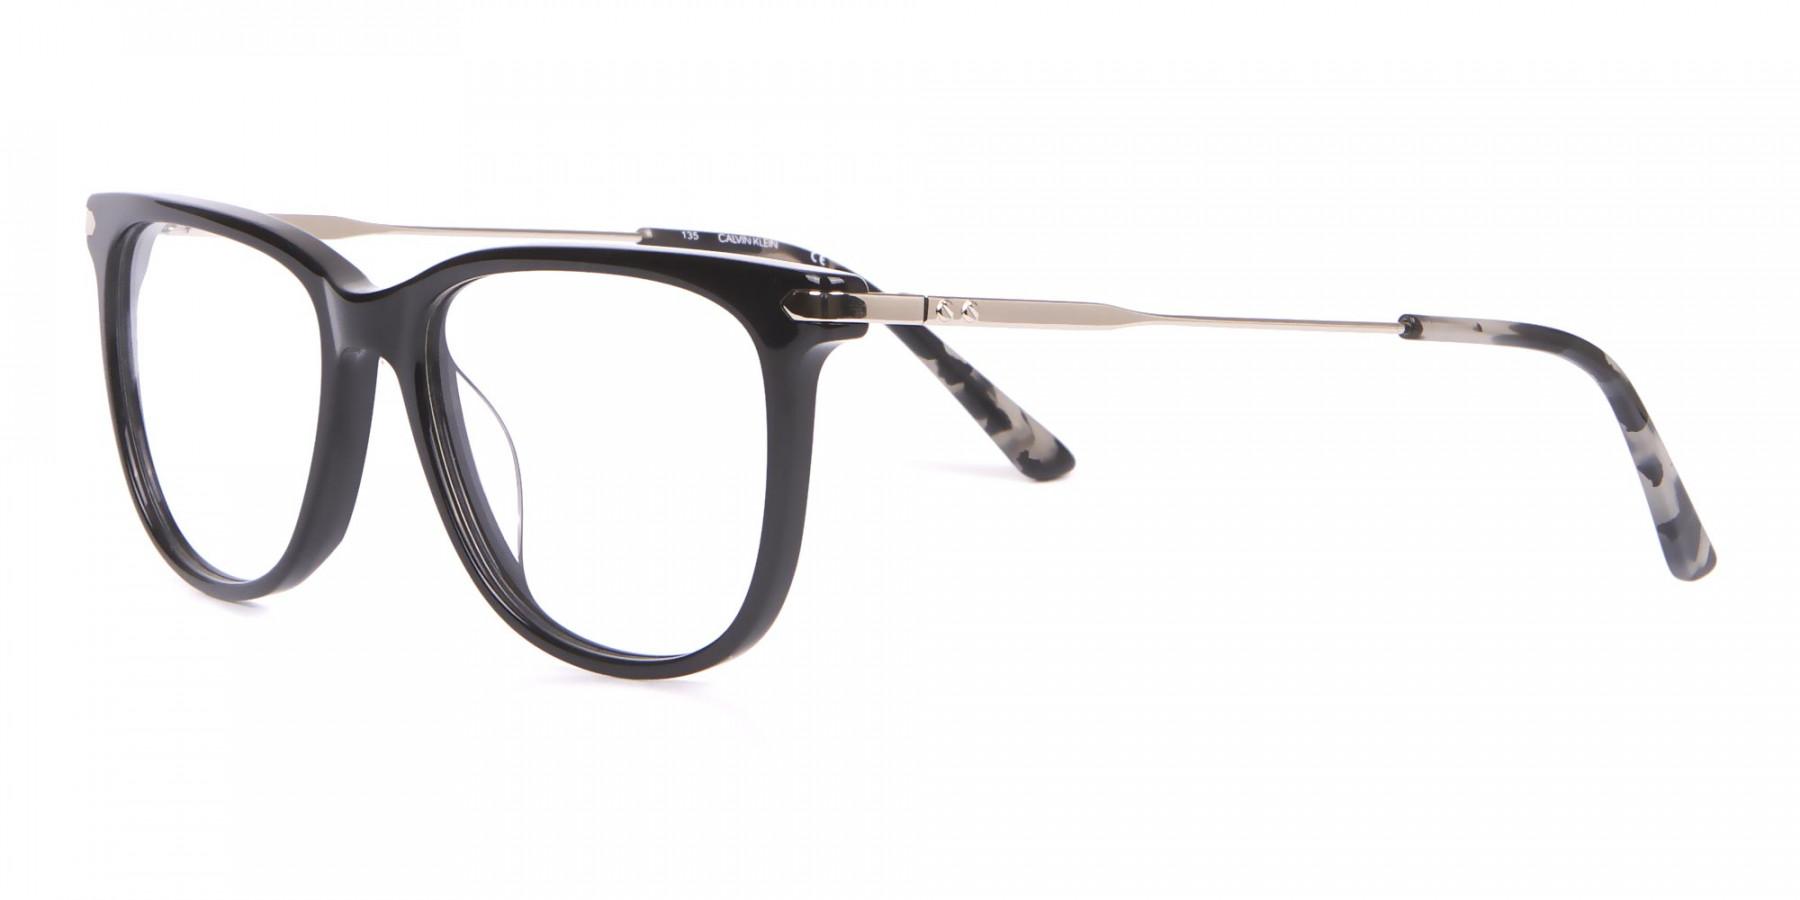 Calvin Klein CK19704 Wayfarer Glasses In Glossy Black-1